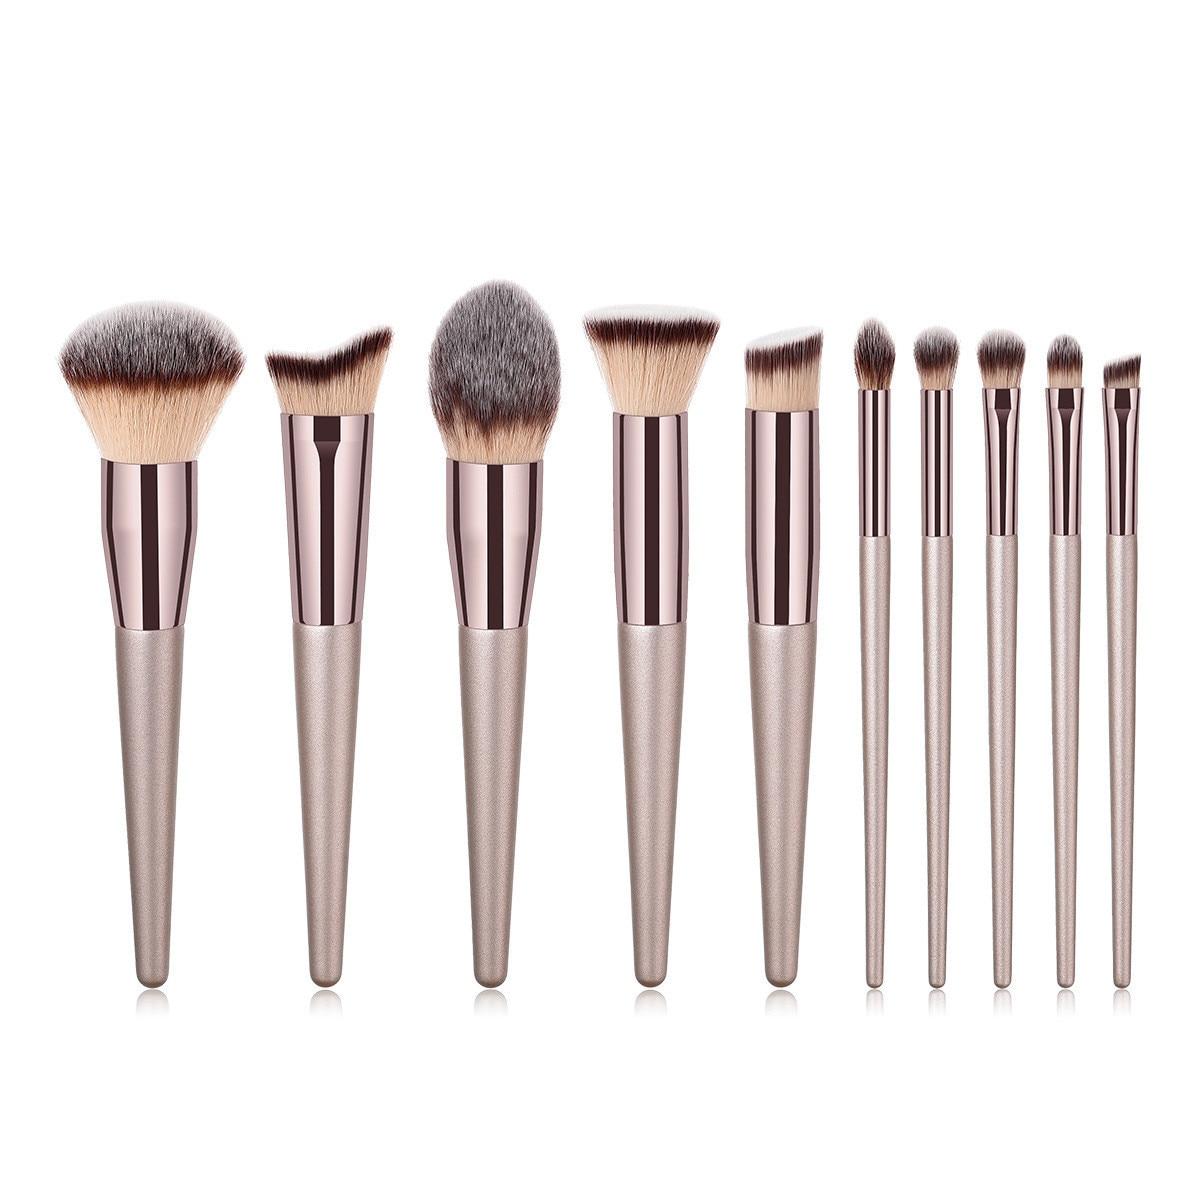 Champagne Makeup Brushes Set Foundation Powder Blush Eyeshadow Concealer Lip Eye Make Up Brush Cosmetics Beauty Tools